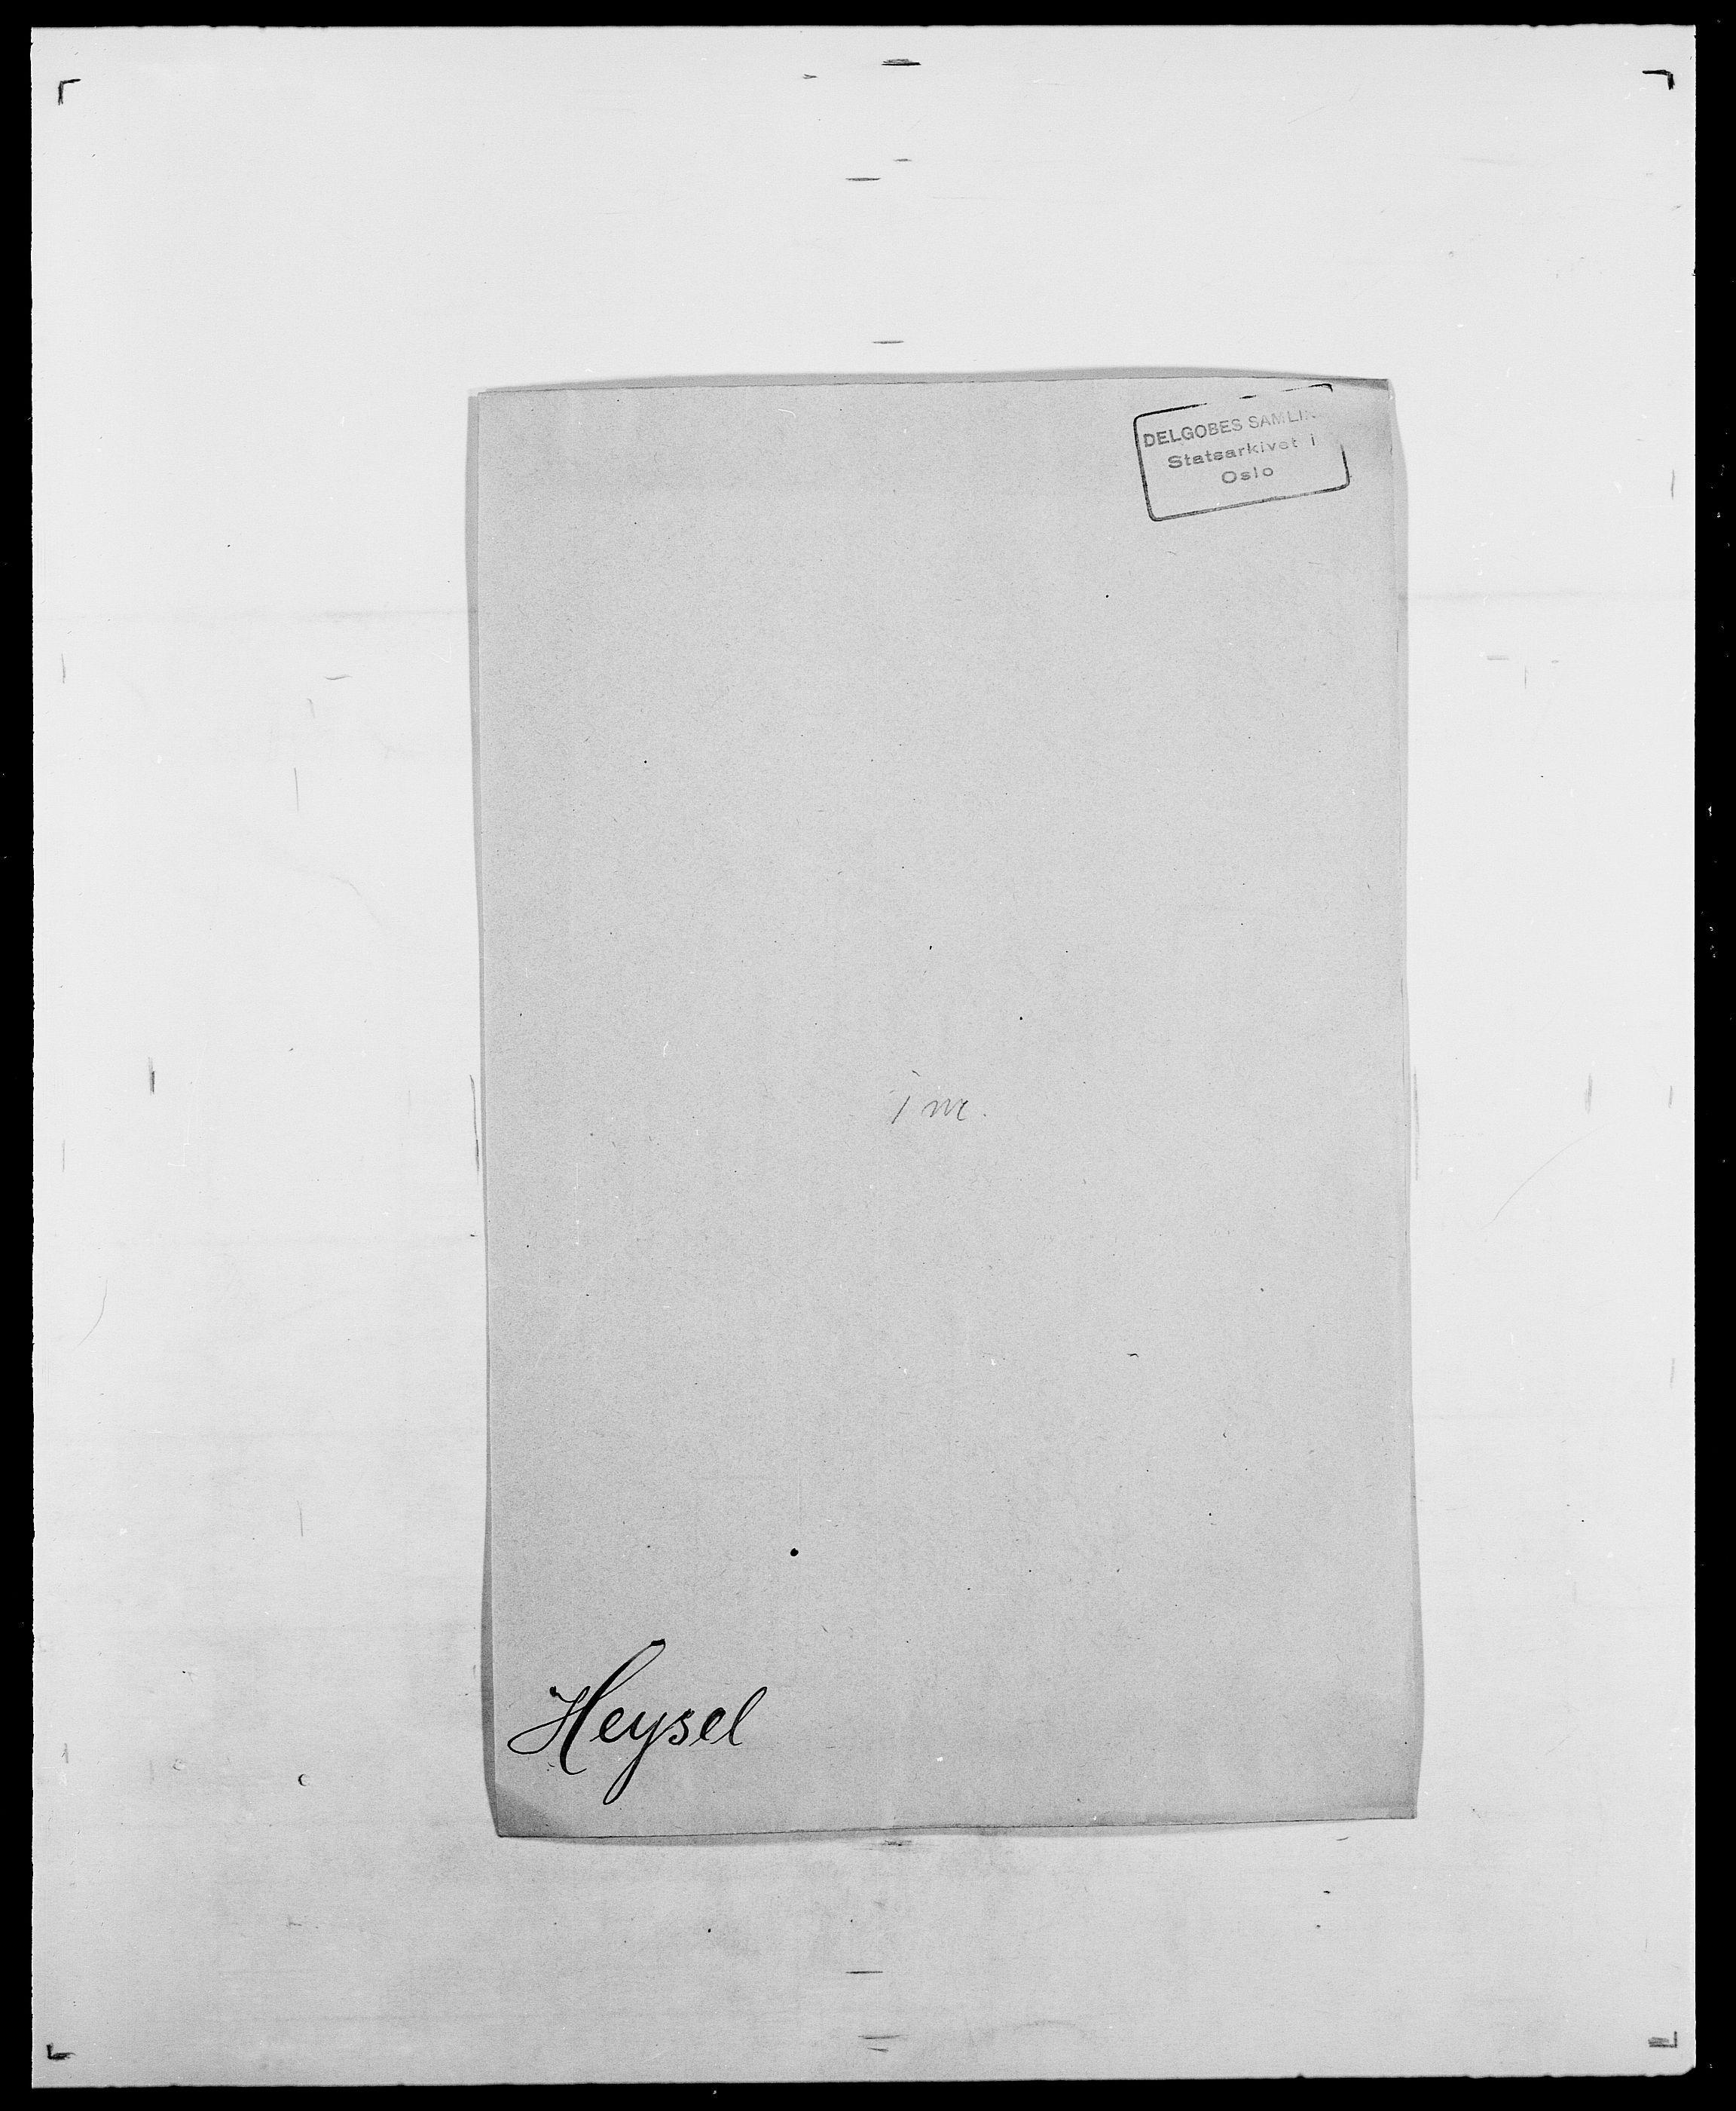 SAO, Delgobe, Charles Antoine - samling, D/Da/L0017: Helander - Hjørne, s. 395